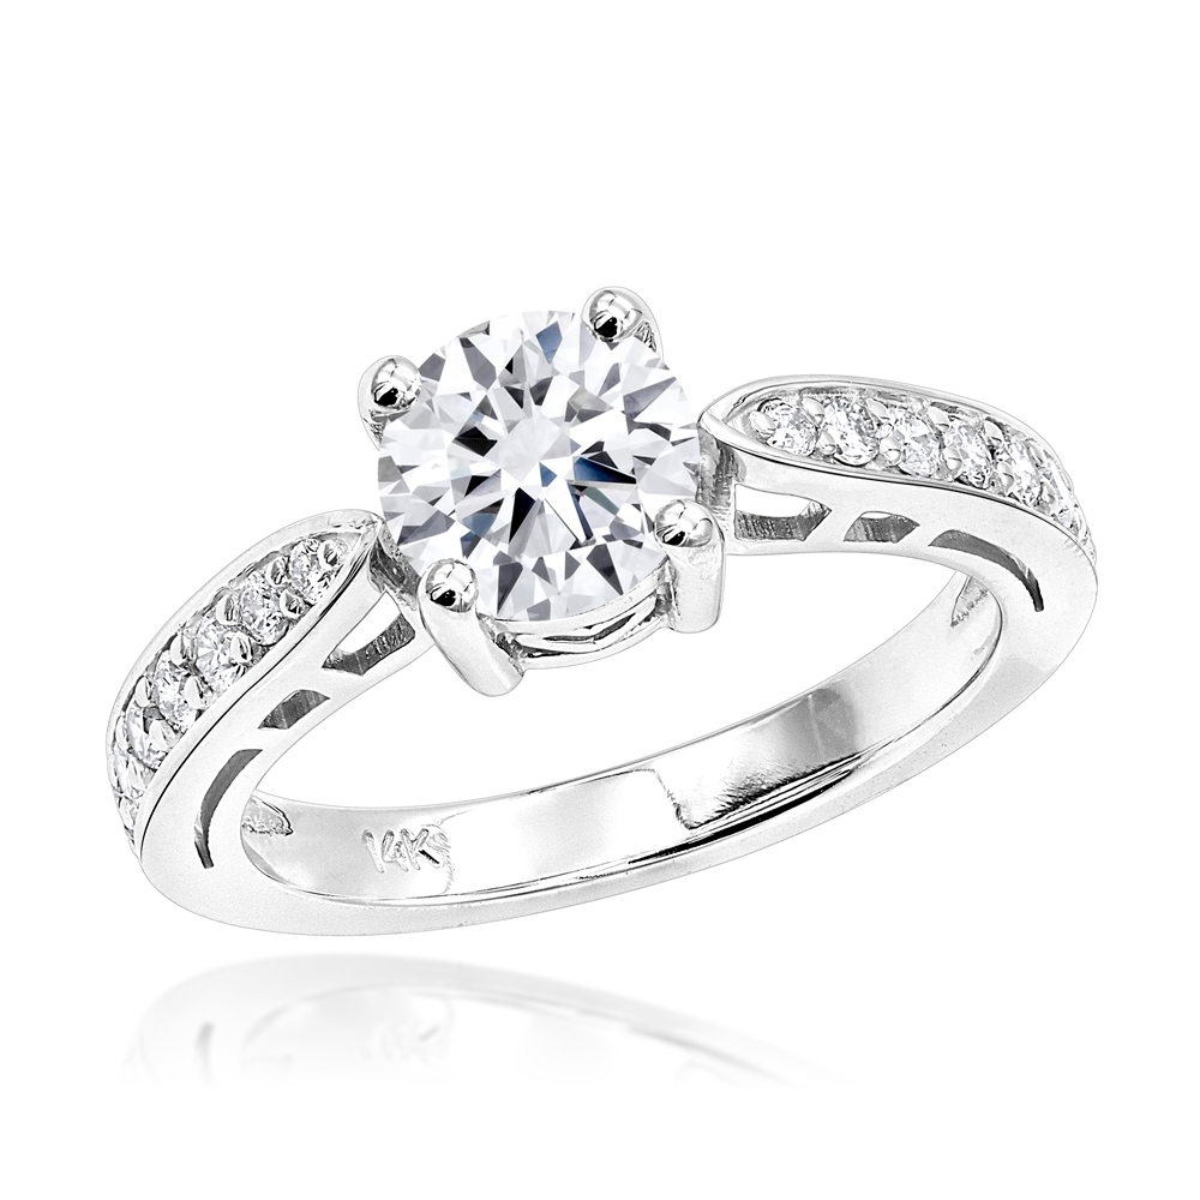 14K Gold Round Diamond Engagement Ring 1.25ctw